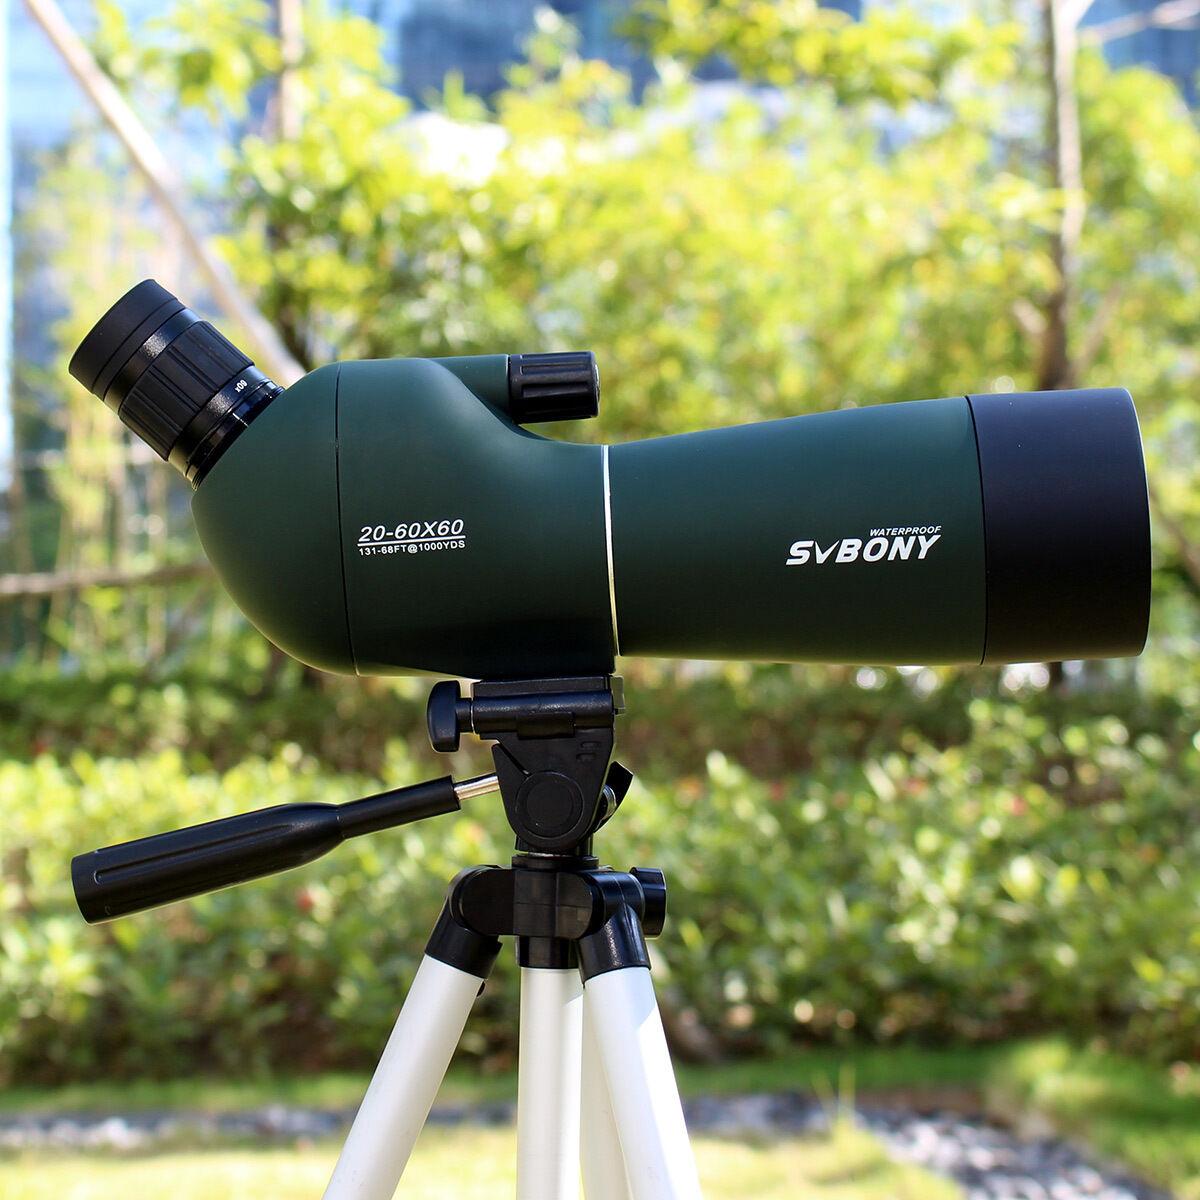 SVBONY 20-60x60mm Angled Spotting Scope Zoom Monocular Birdwatch Telescope IP65